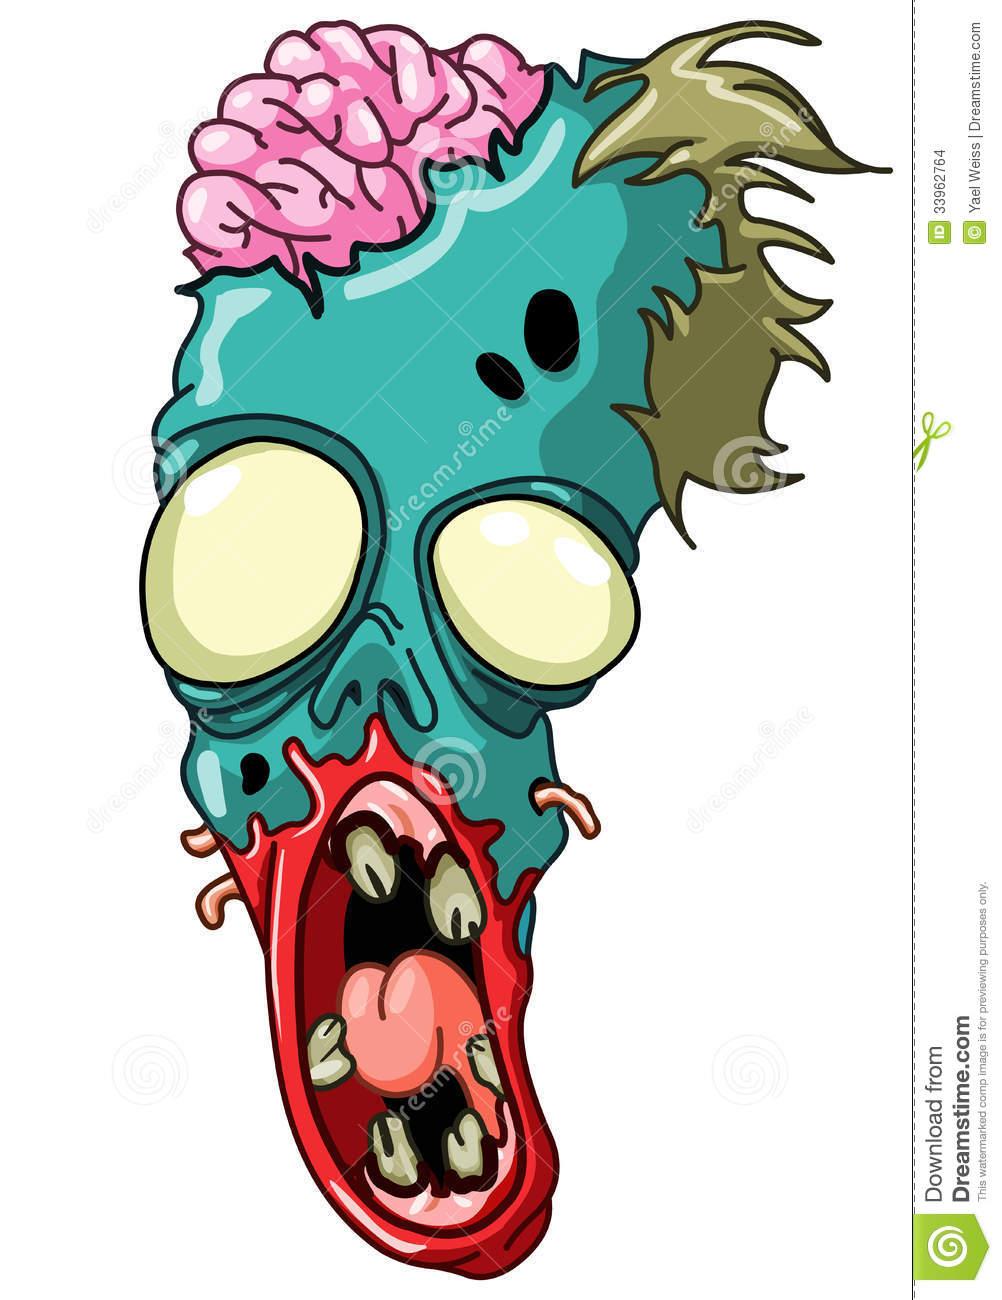 Zombie head stock vector. Illustration of clipart, bones.